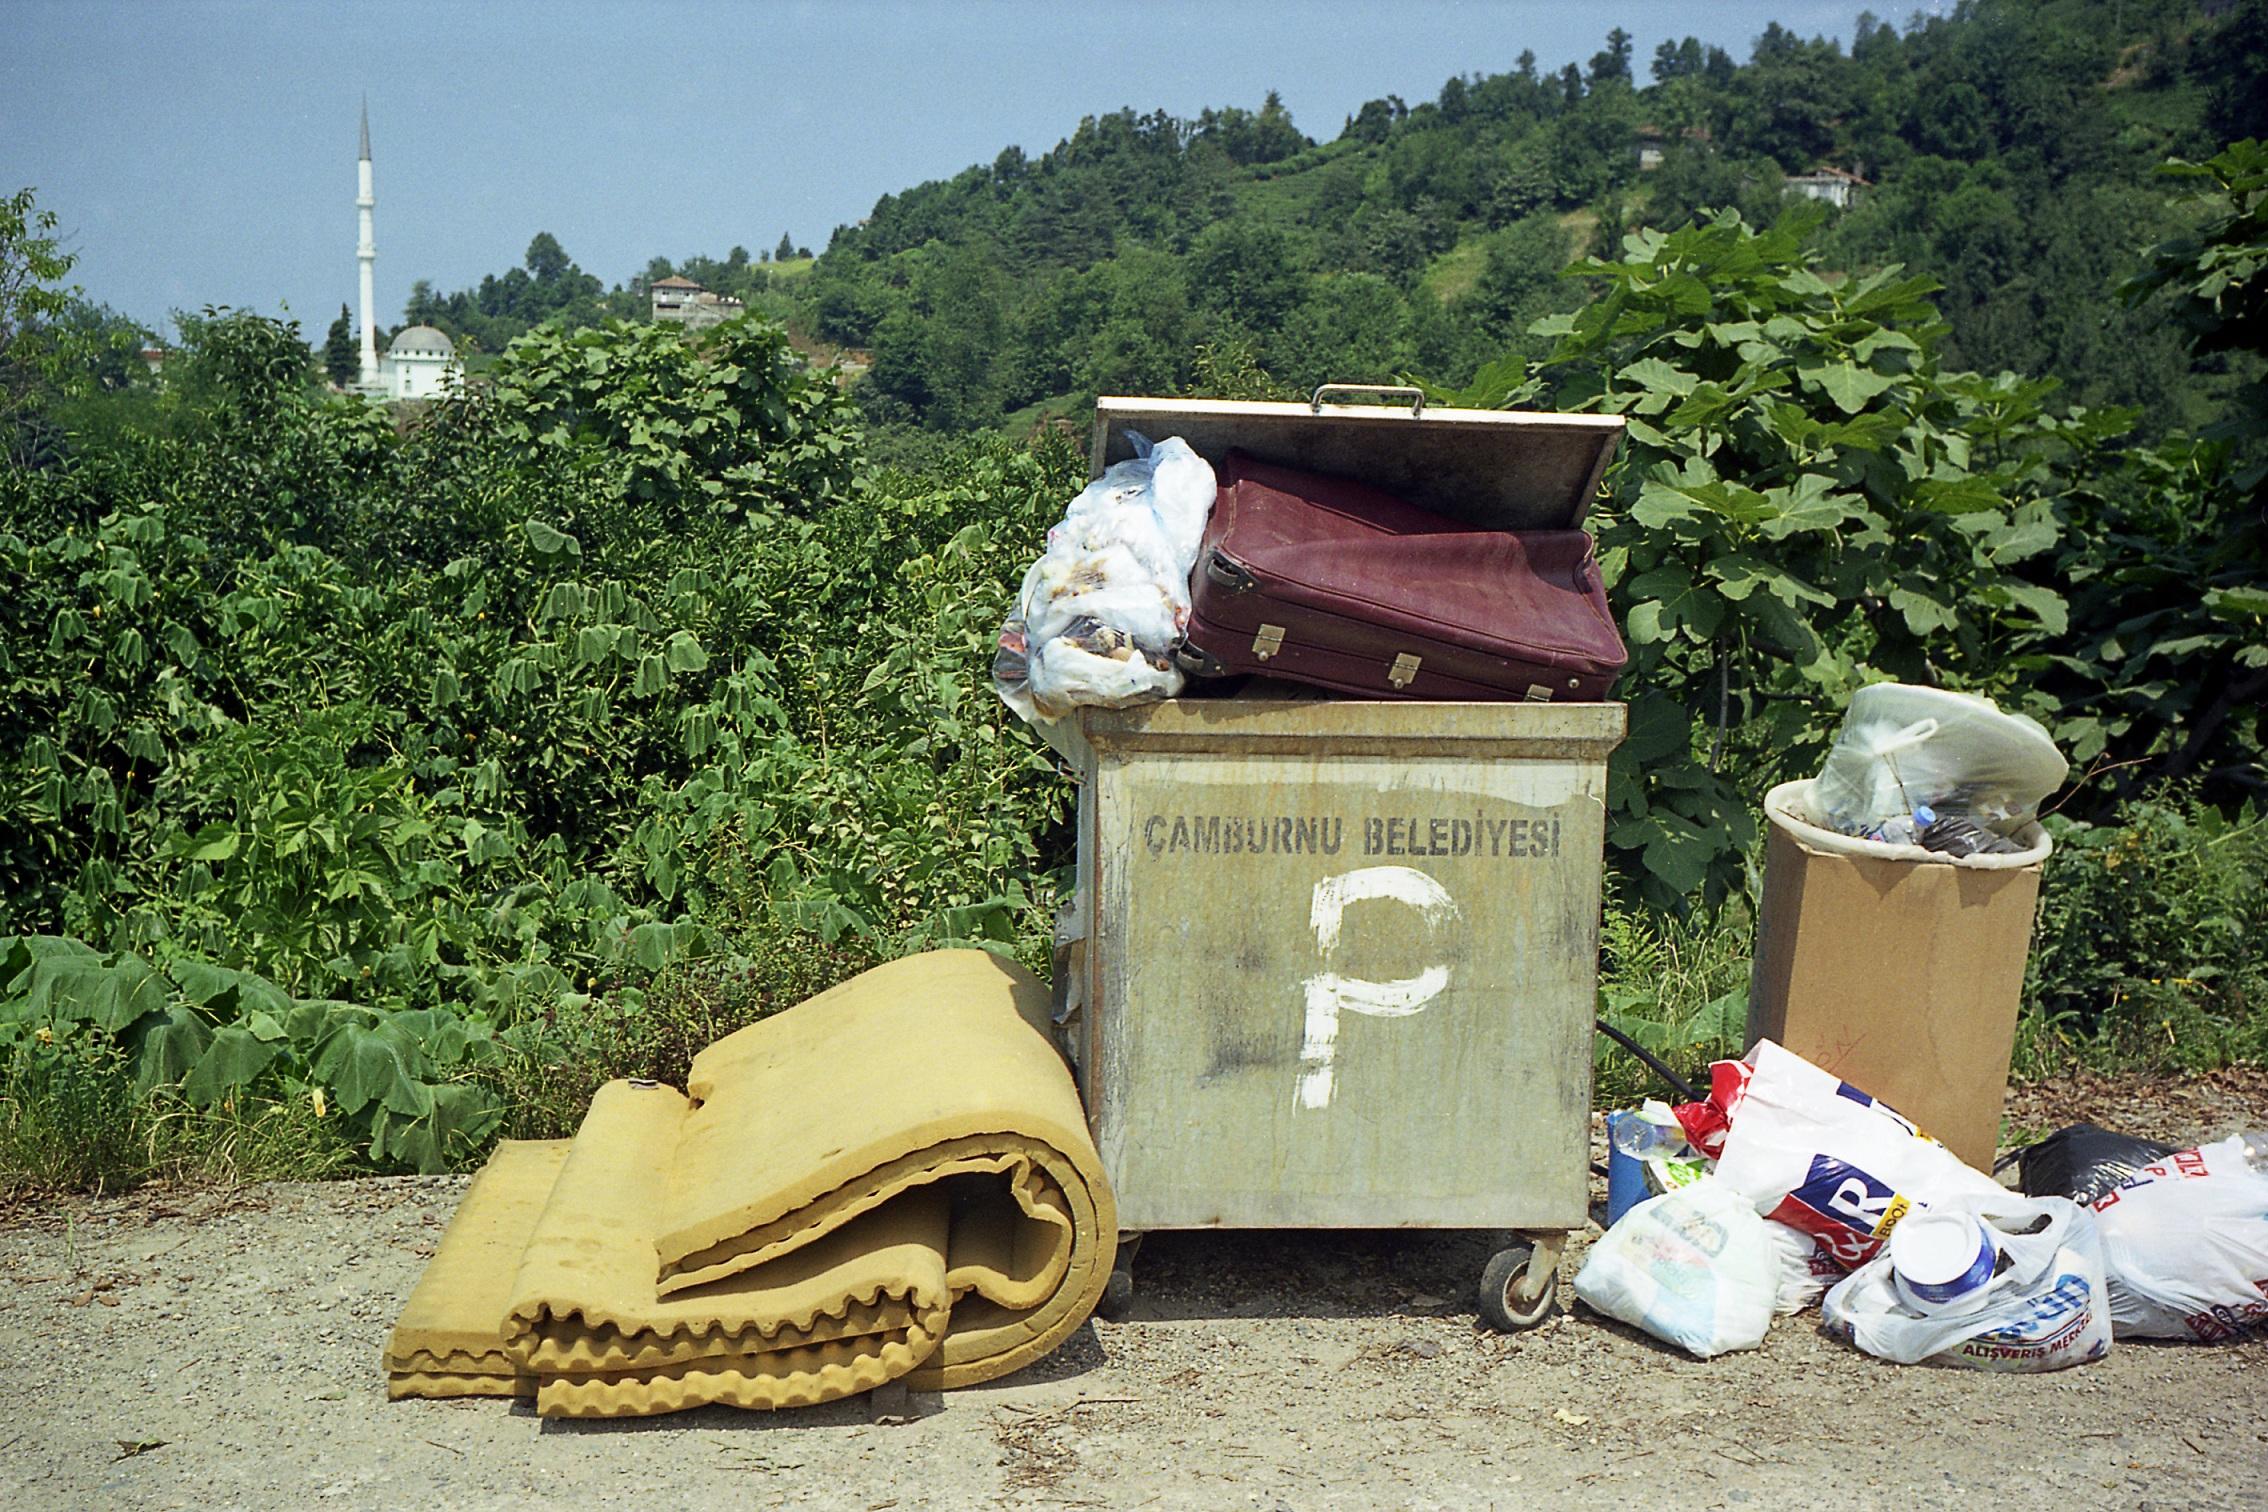 Altcine polluting paradise for Garten eden